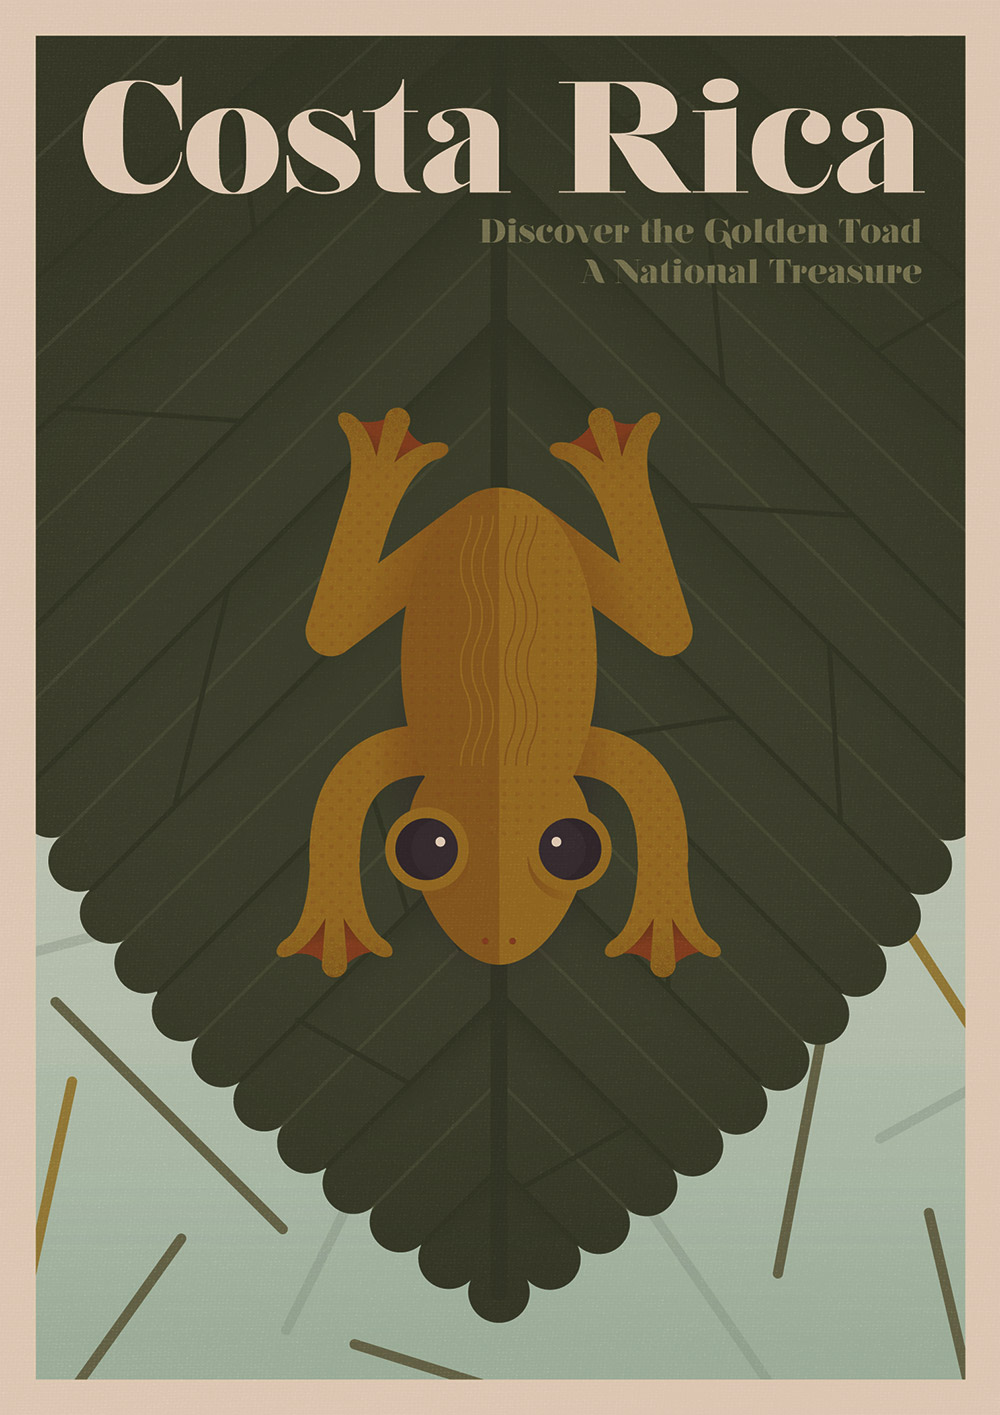 Golden Toad The Golden Toad went extinct in 1989. It only had a minute habitat in Costa Rica's Reserva Biológica Monteverde.